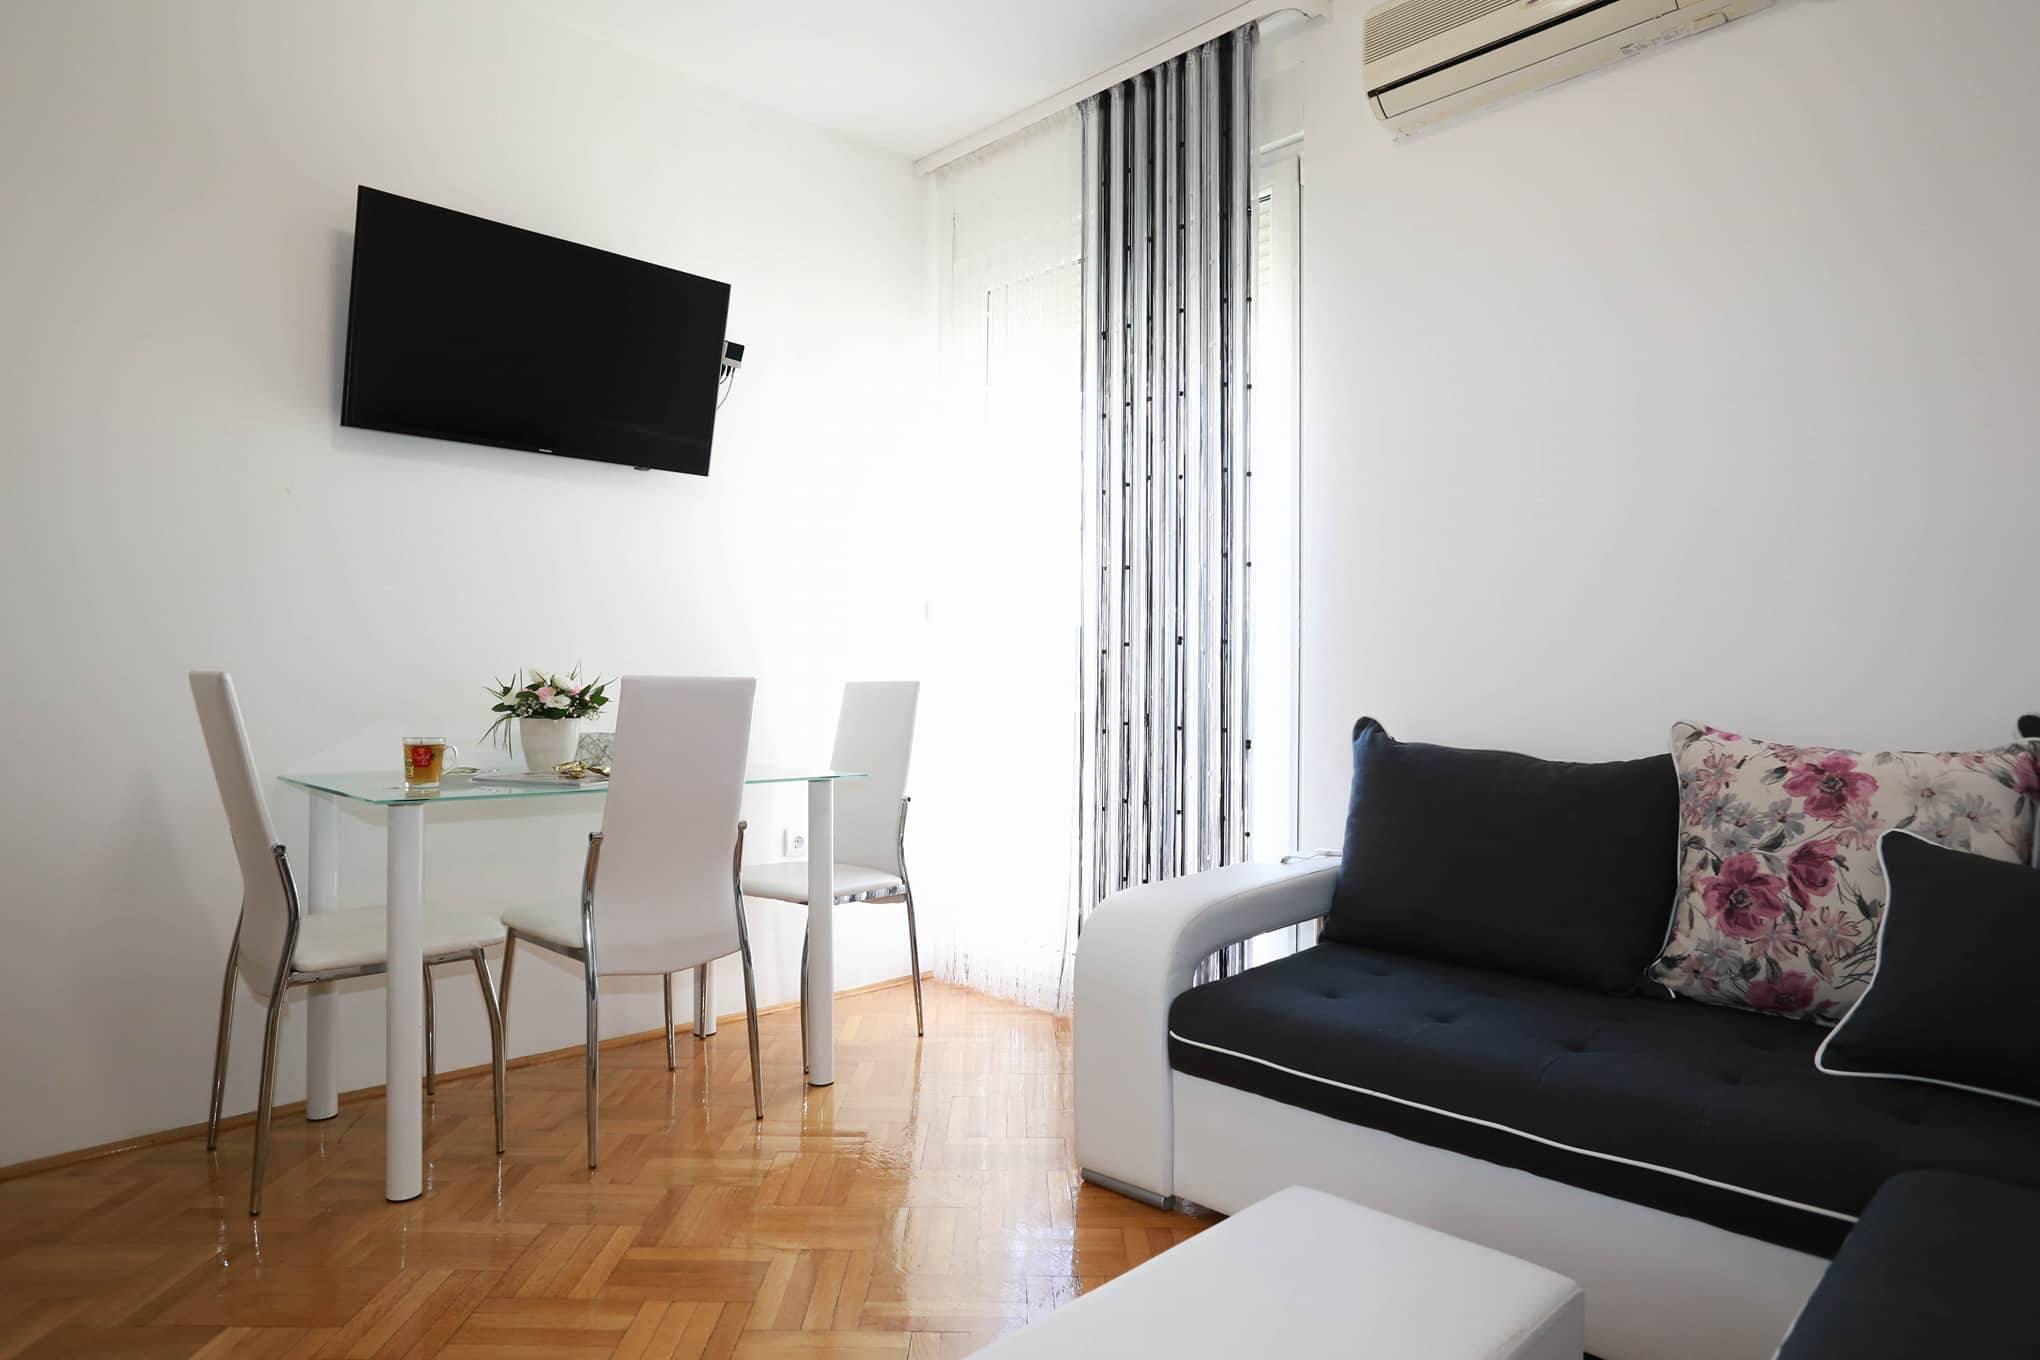 Studio 20 m2 in Budva center, next to hotel Tree Canne – Nekretnine ...